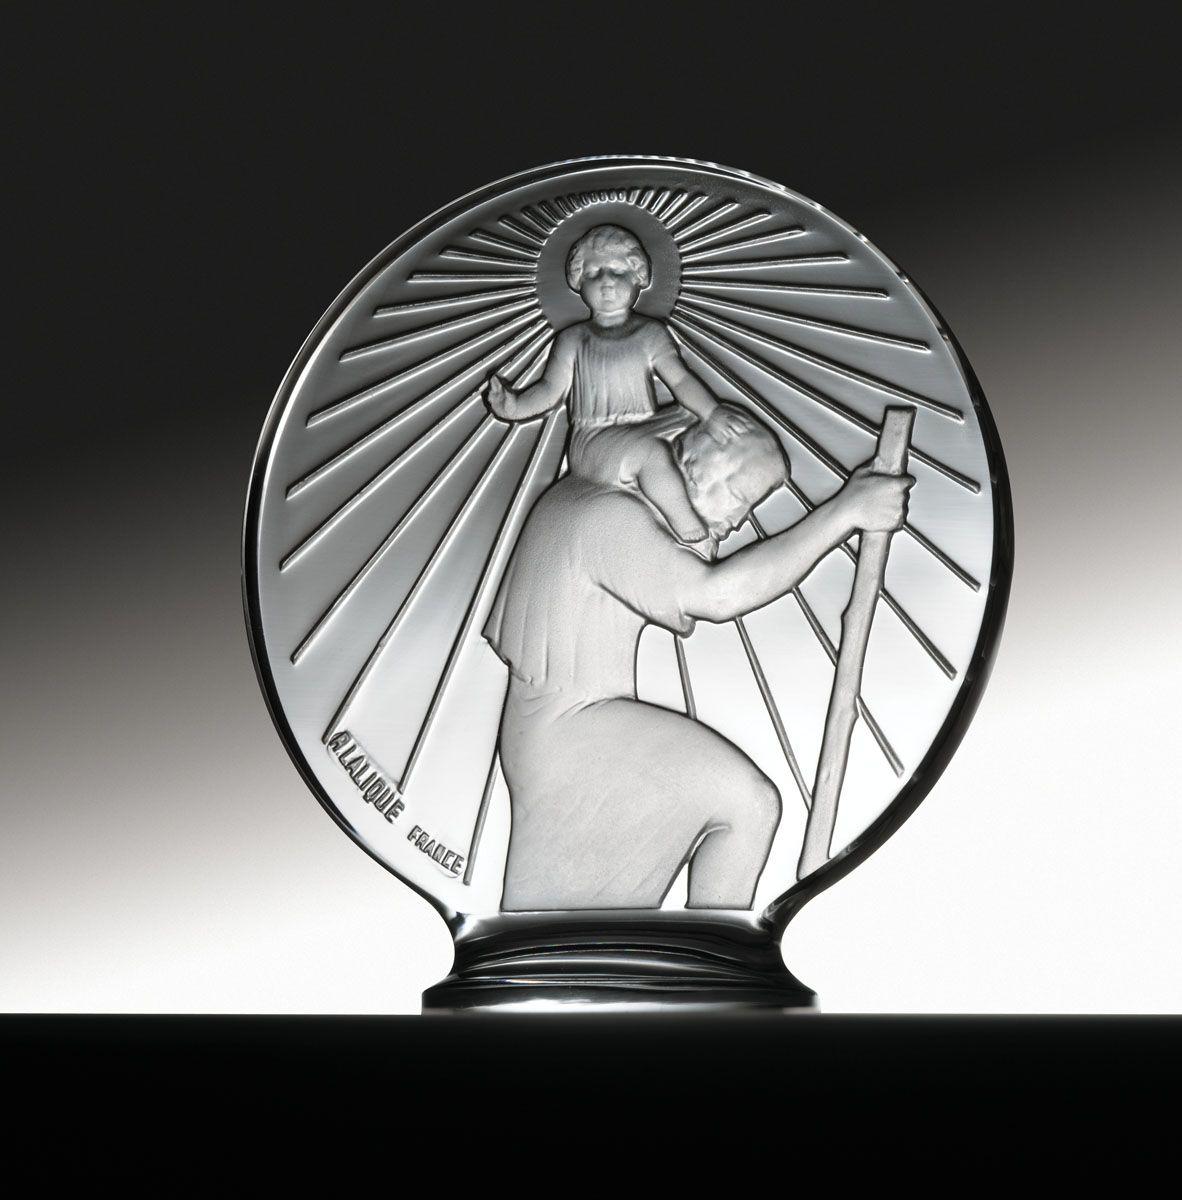 Hood Ornaments / LALIQUE AUTOMOBILE MASCOTS, 1932 / Saint Christophe (Photo Credit Courtesy of RM Auctions)